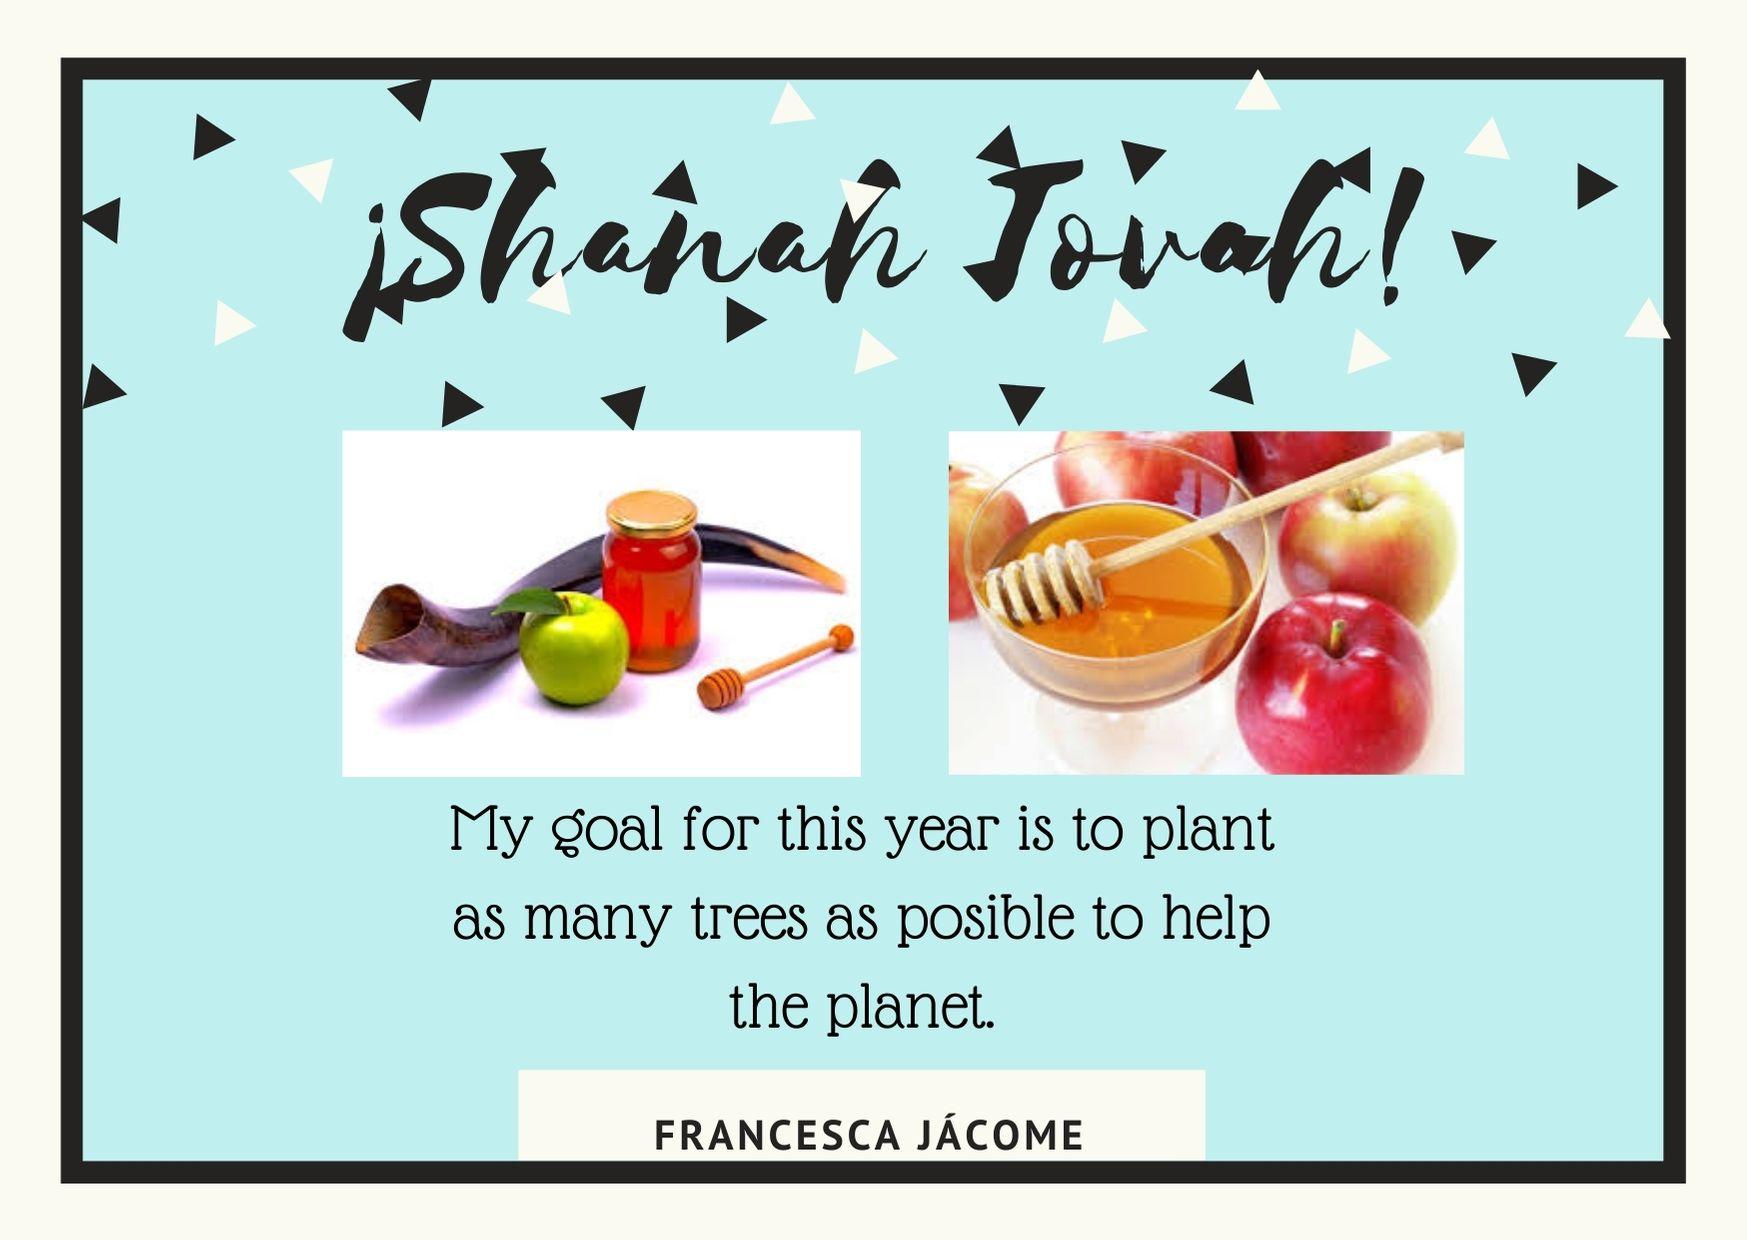 shanah tovah francesca jacome